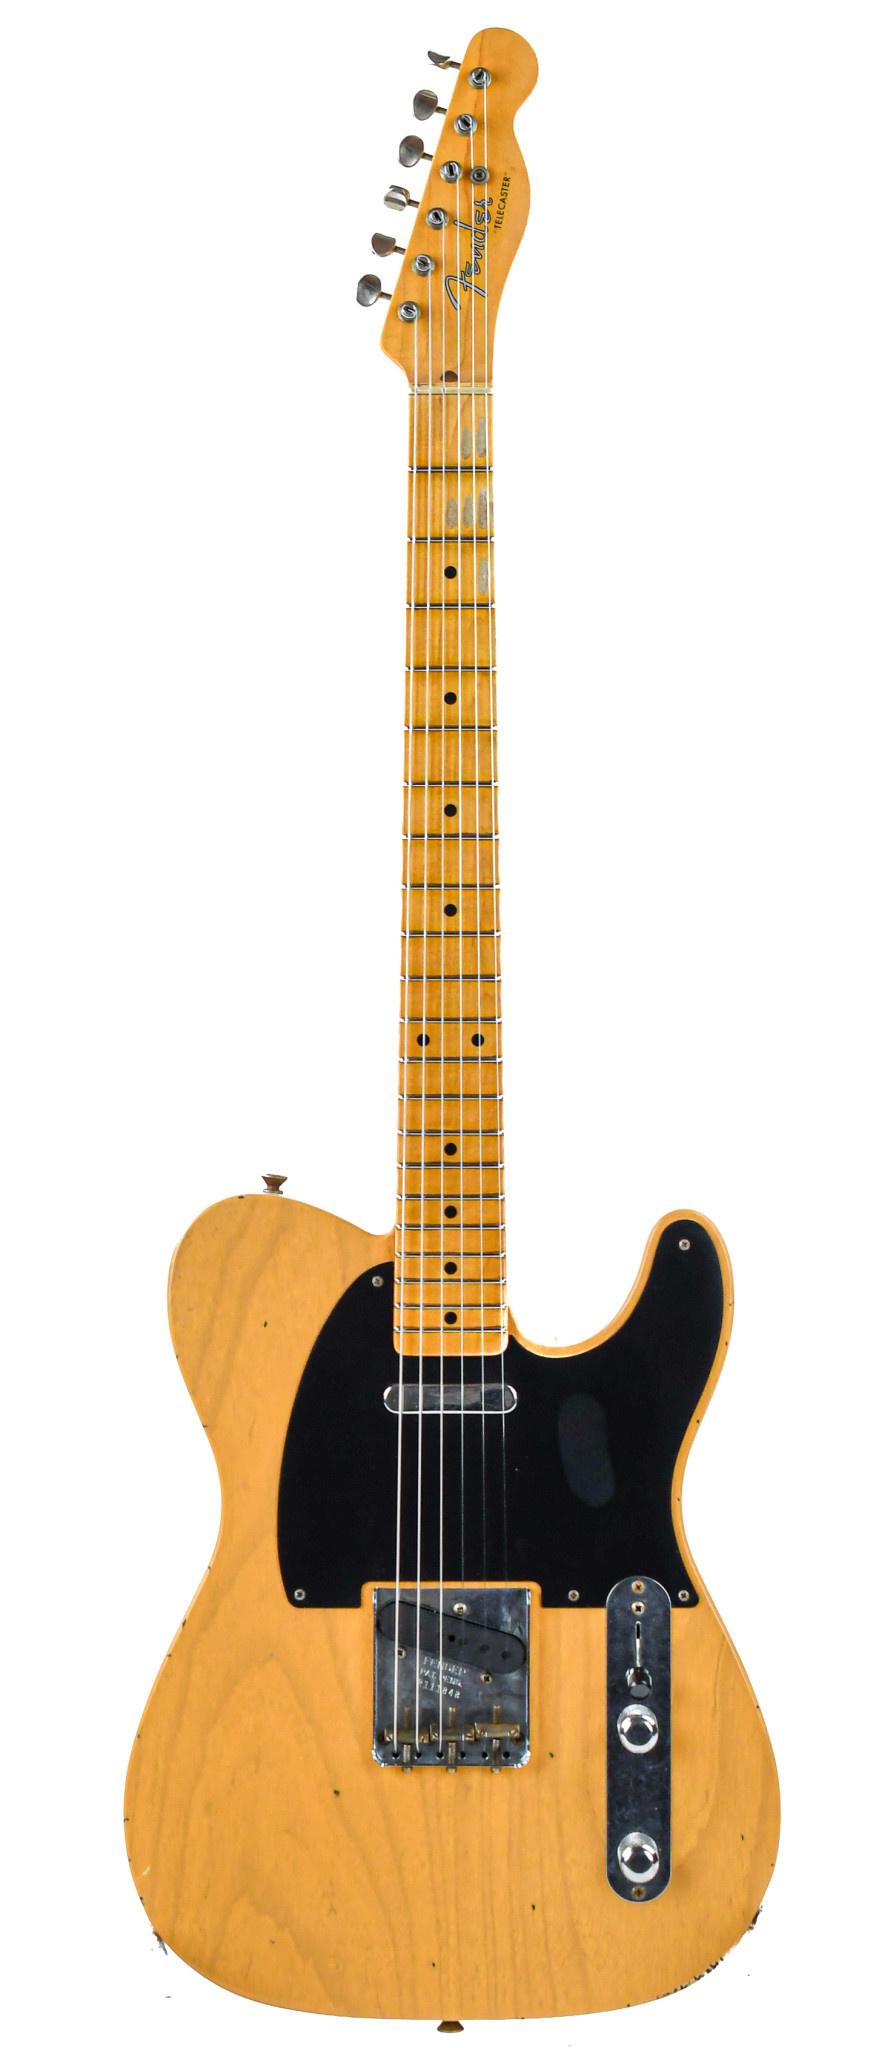 Fender Custom Shop 52 Telecaster Butterscotch Blonde Journeyman Relic